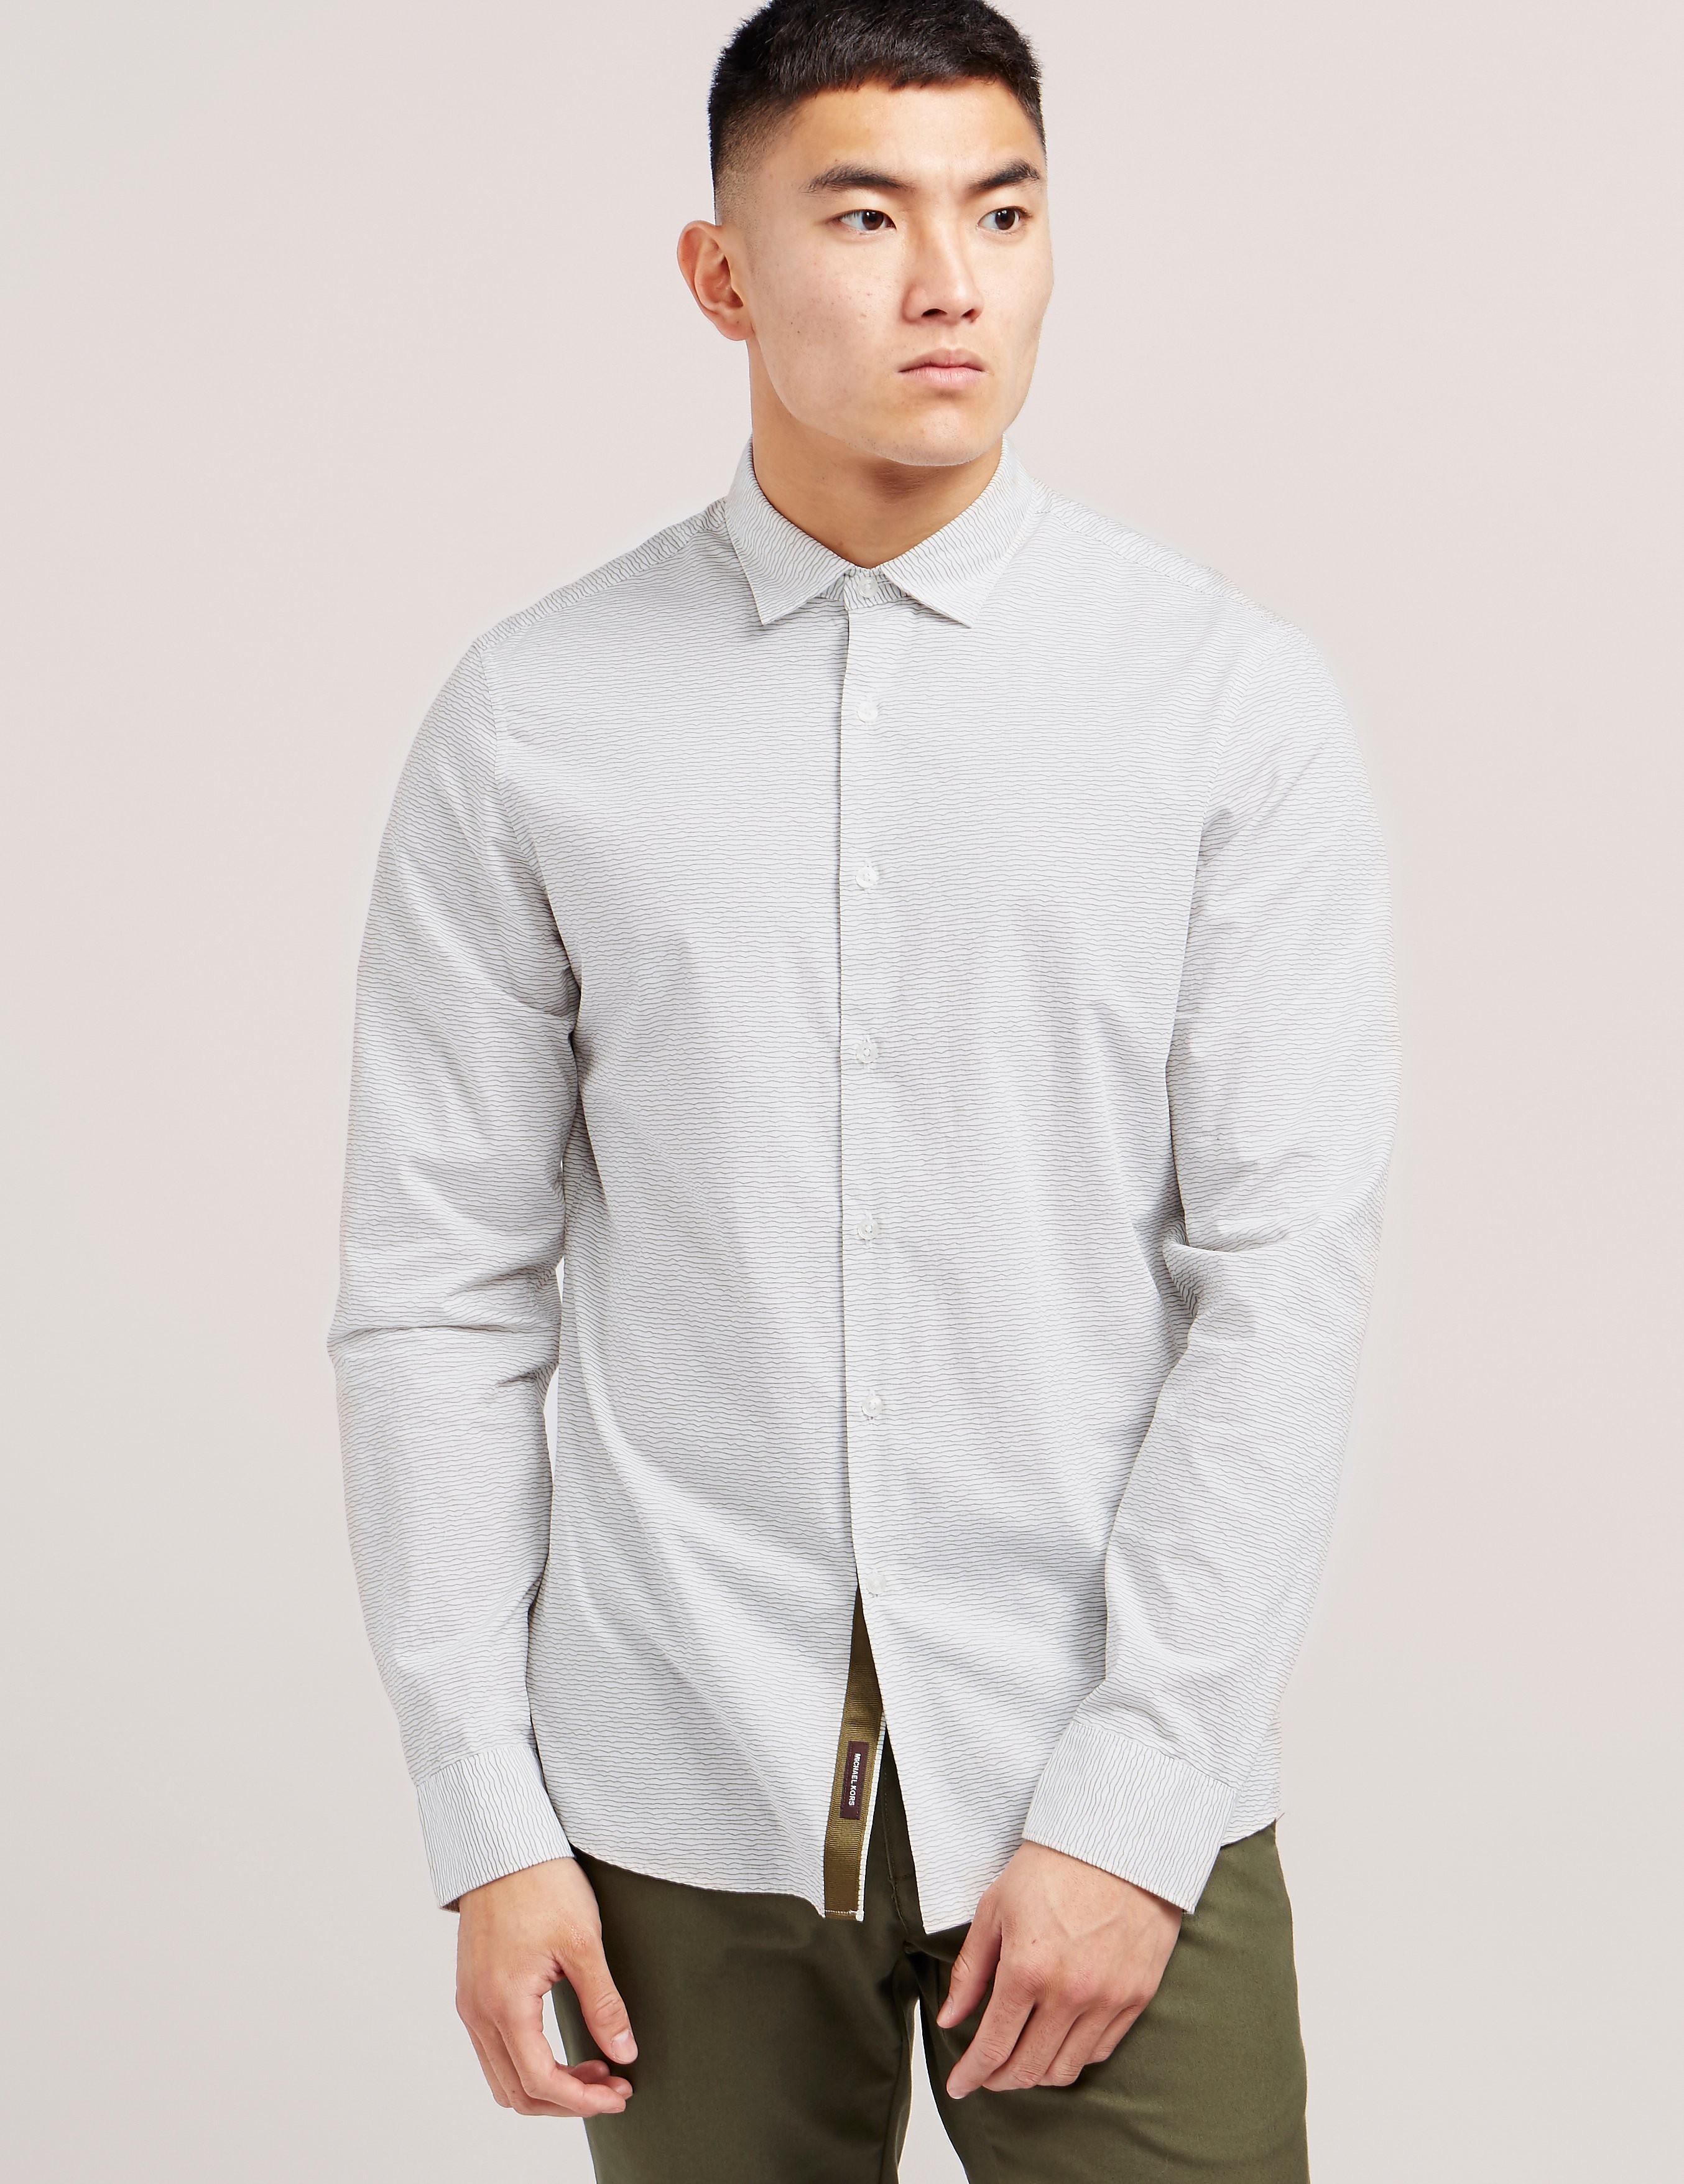 Michael Kors Wave Long Sleeve Shirt